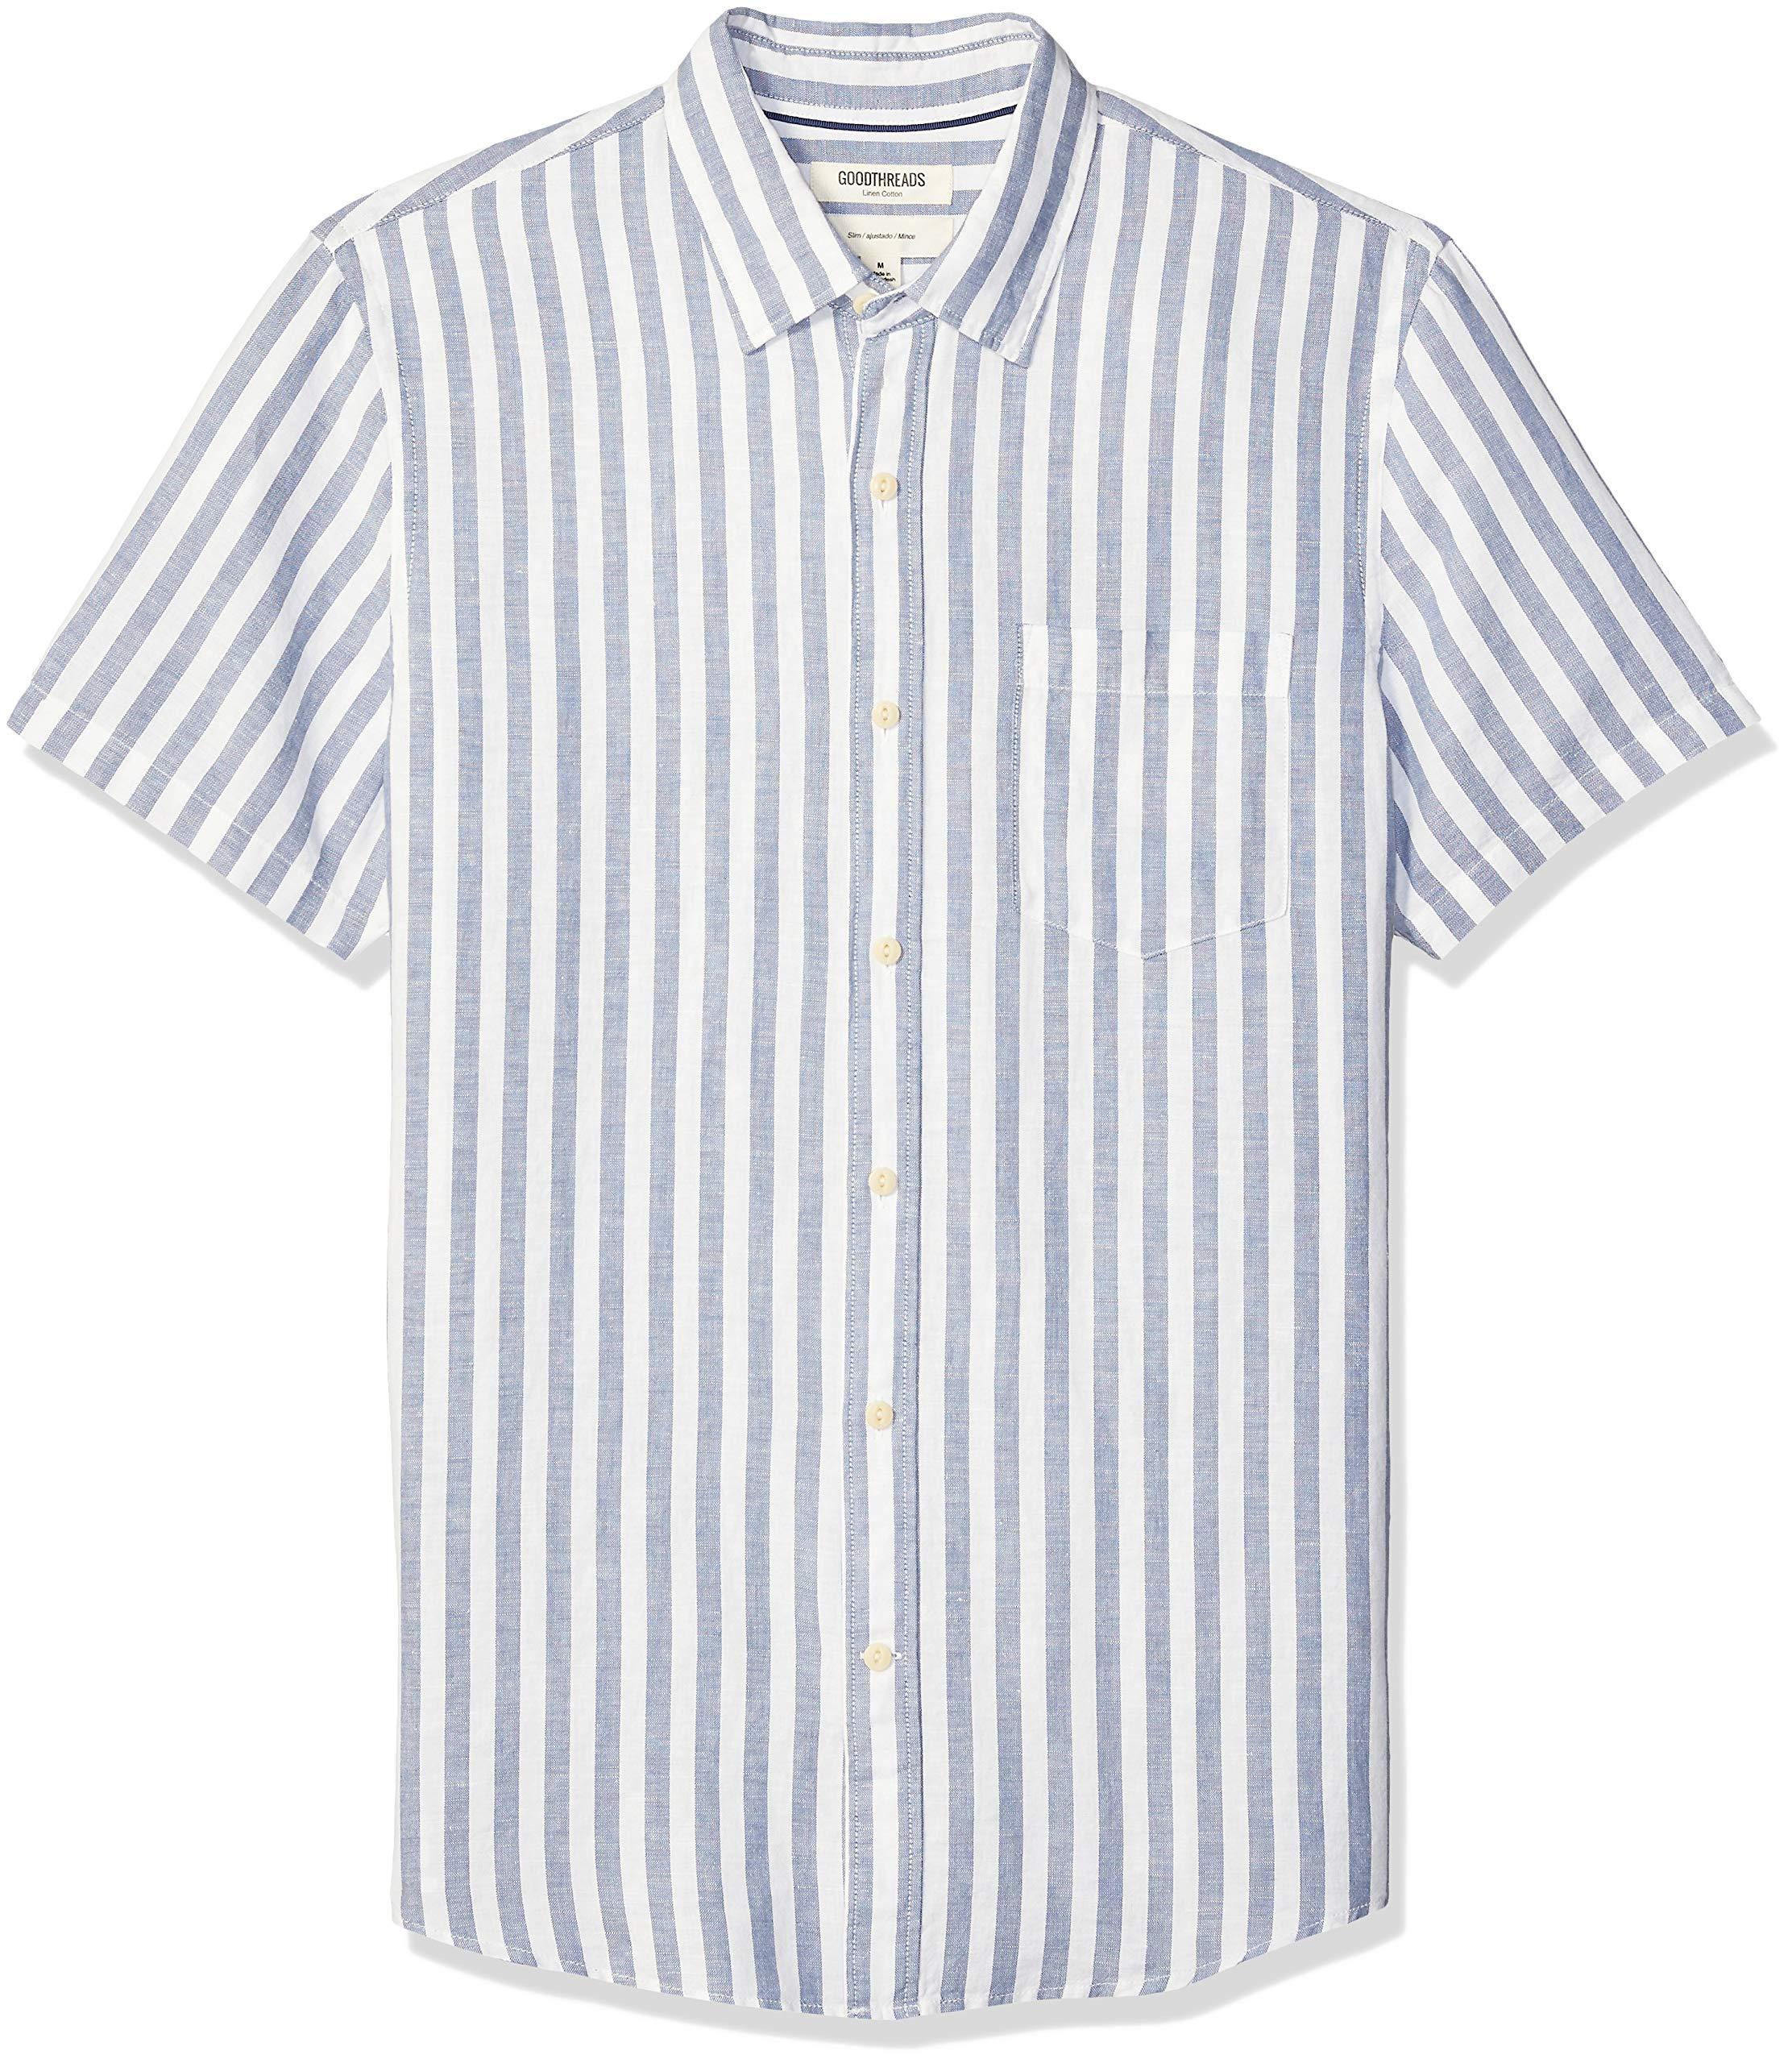 Amazon Brand - Goodthreads Men's Slim-Fit Short-Sleeve Linen and Cotton Blend Shirt